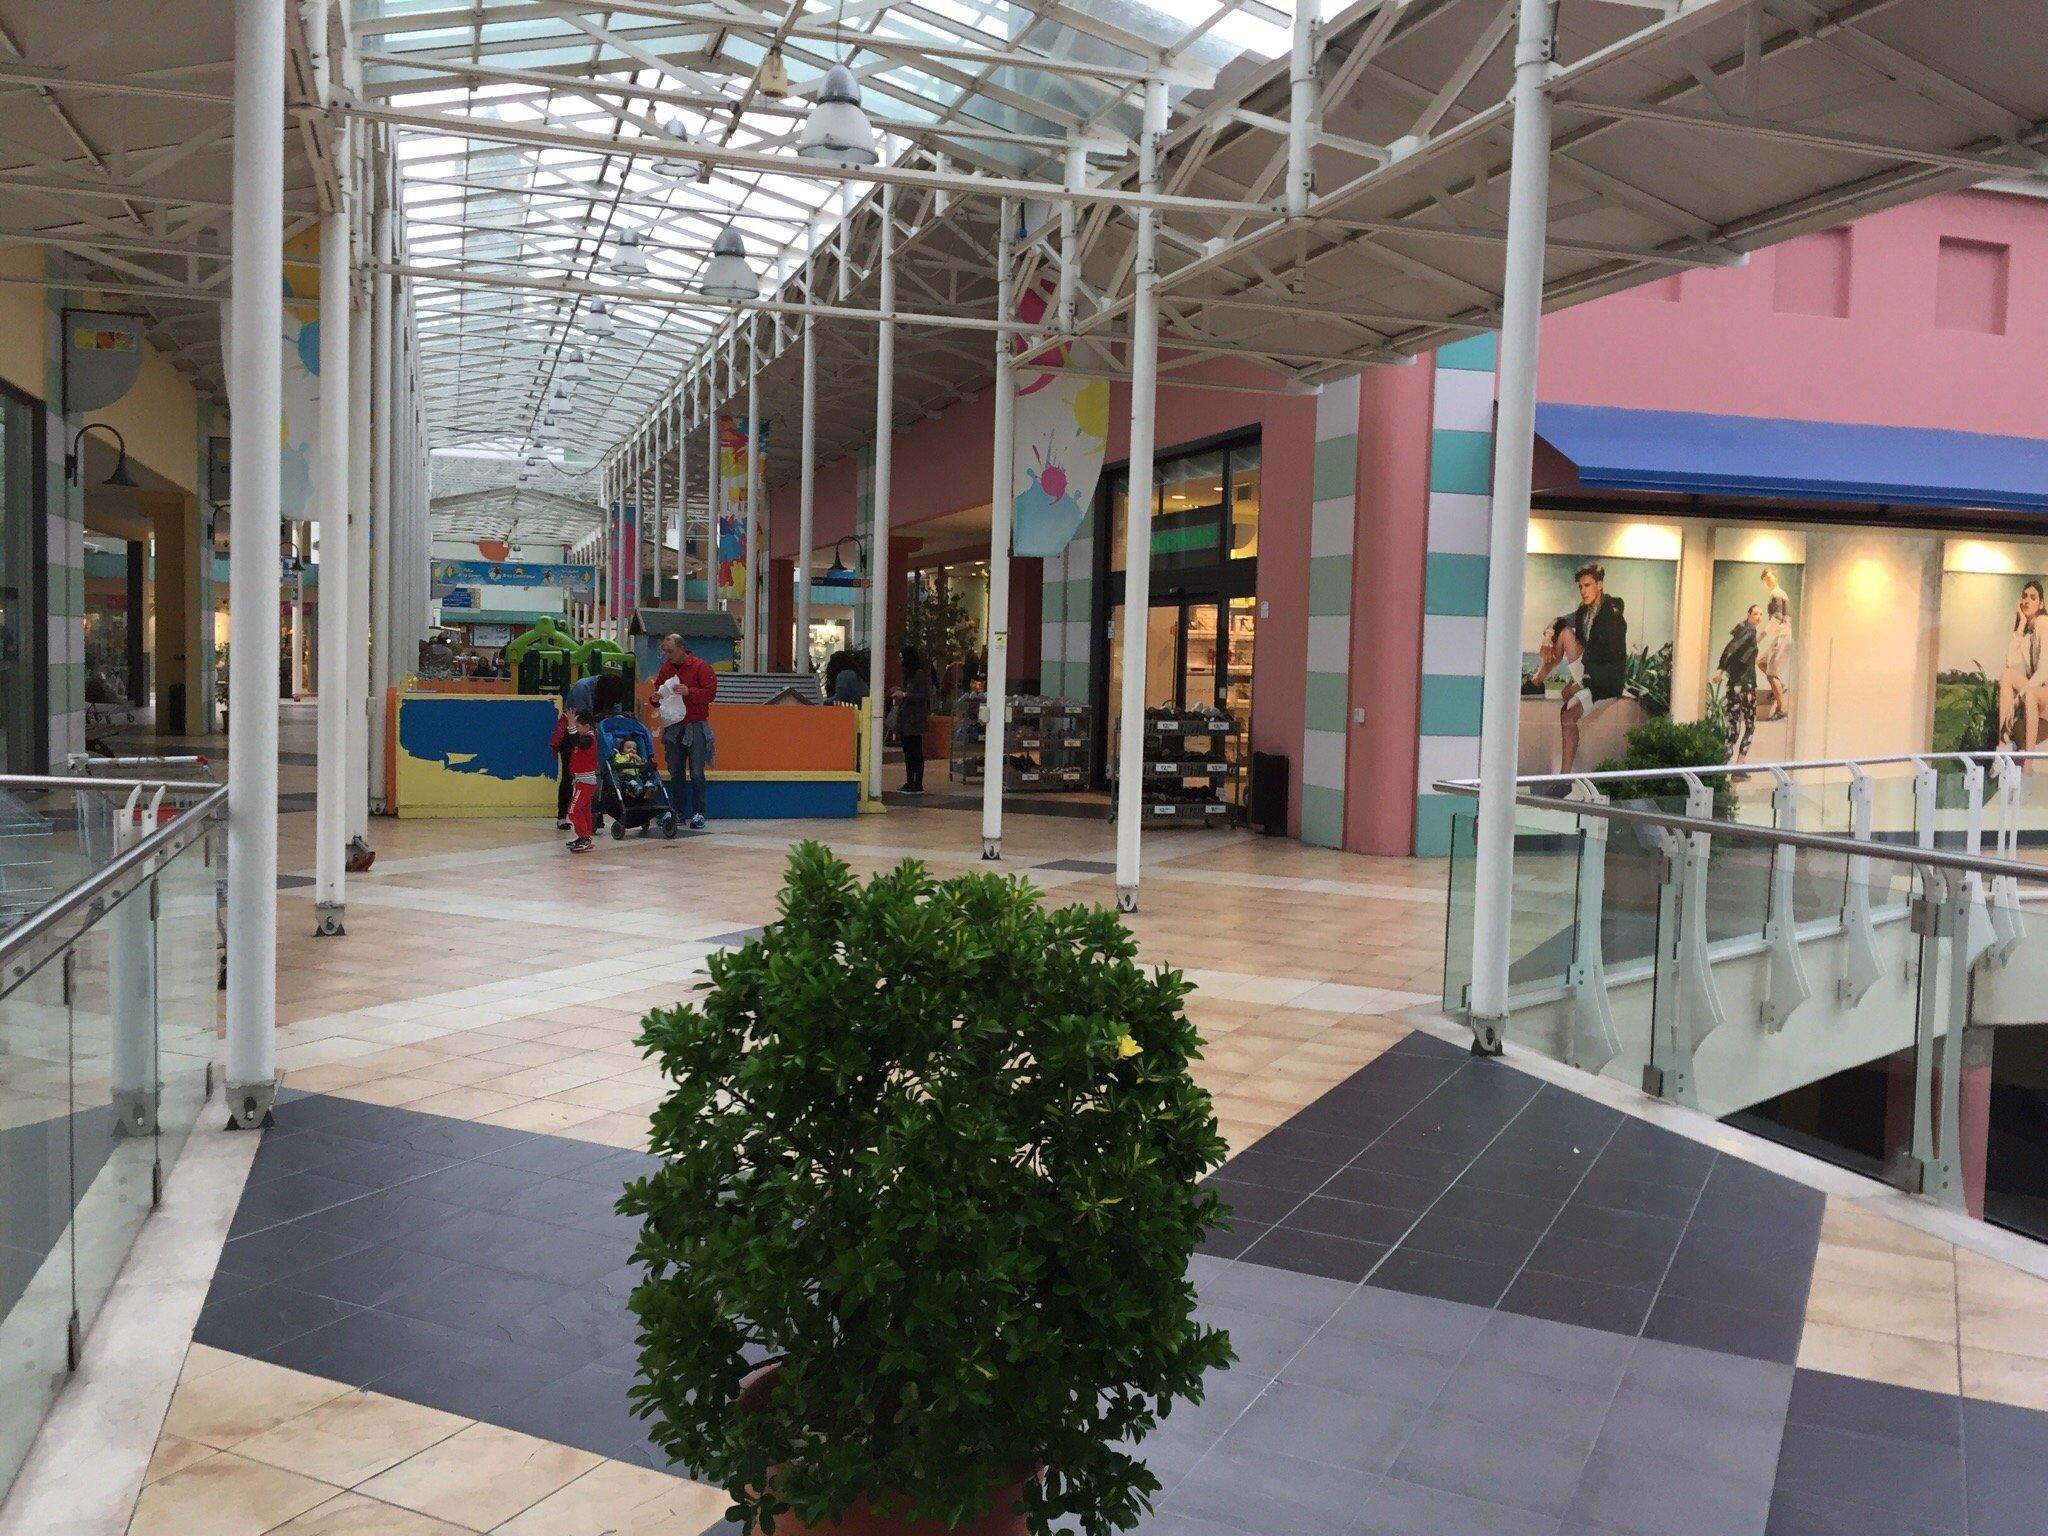 Centro Commerciale L'Arca